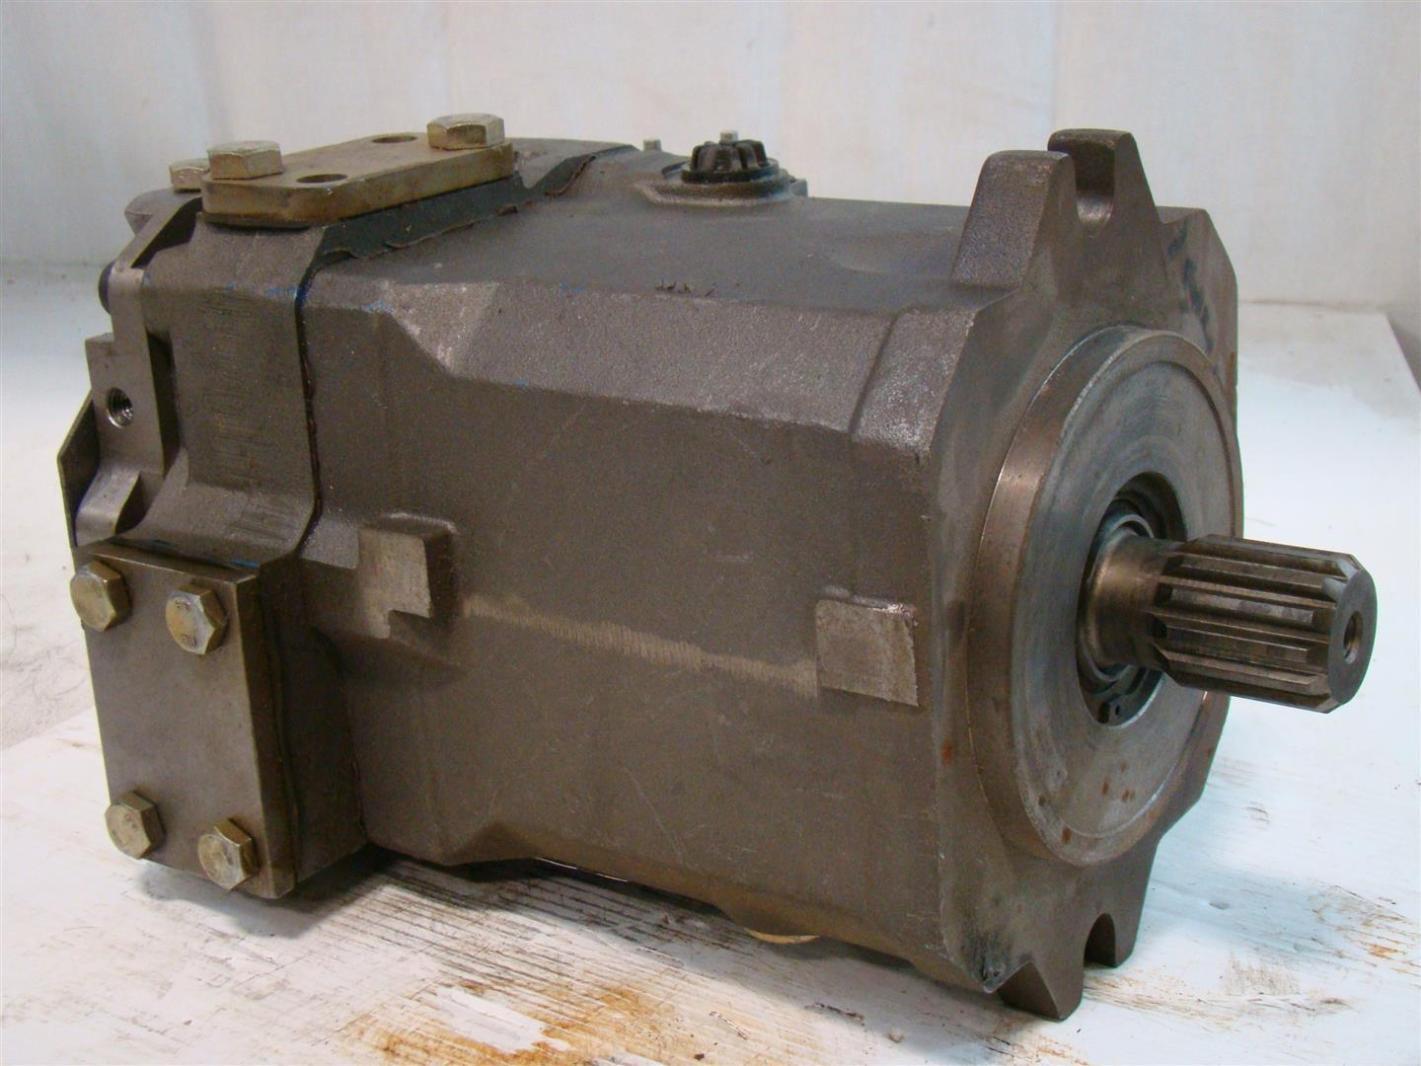 ahl157 linde hydraulic pump h2x256u02078 hpr135 02r 2604 11 linde forklift fuse box location forklifts linde h 50 \u2022 indy500 co linde forklift fuse box location at panicattacktreatment.co